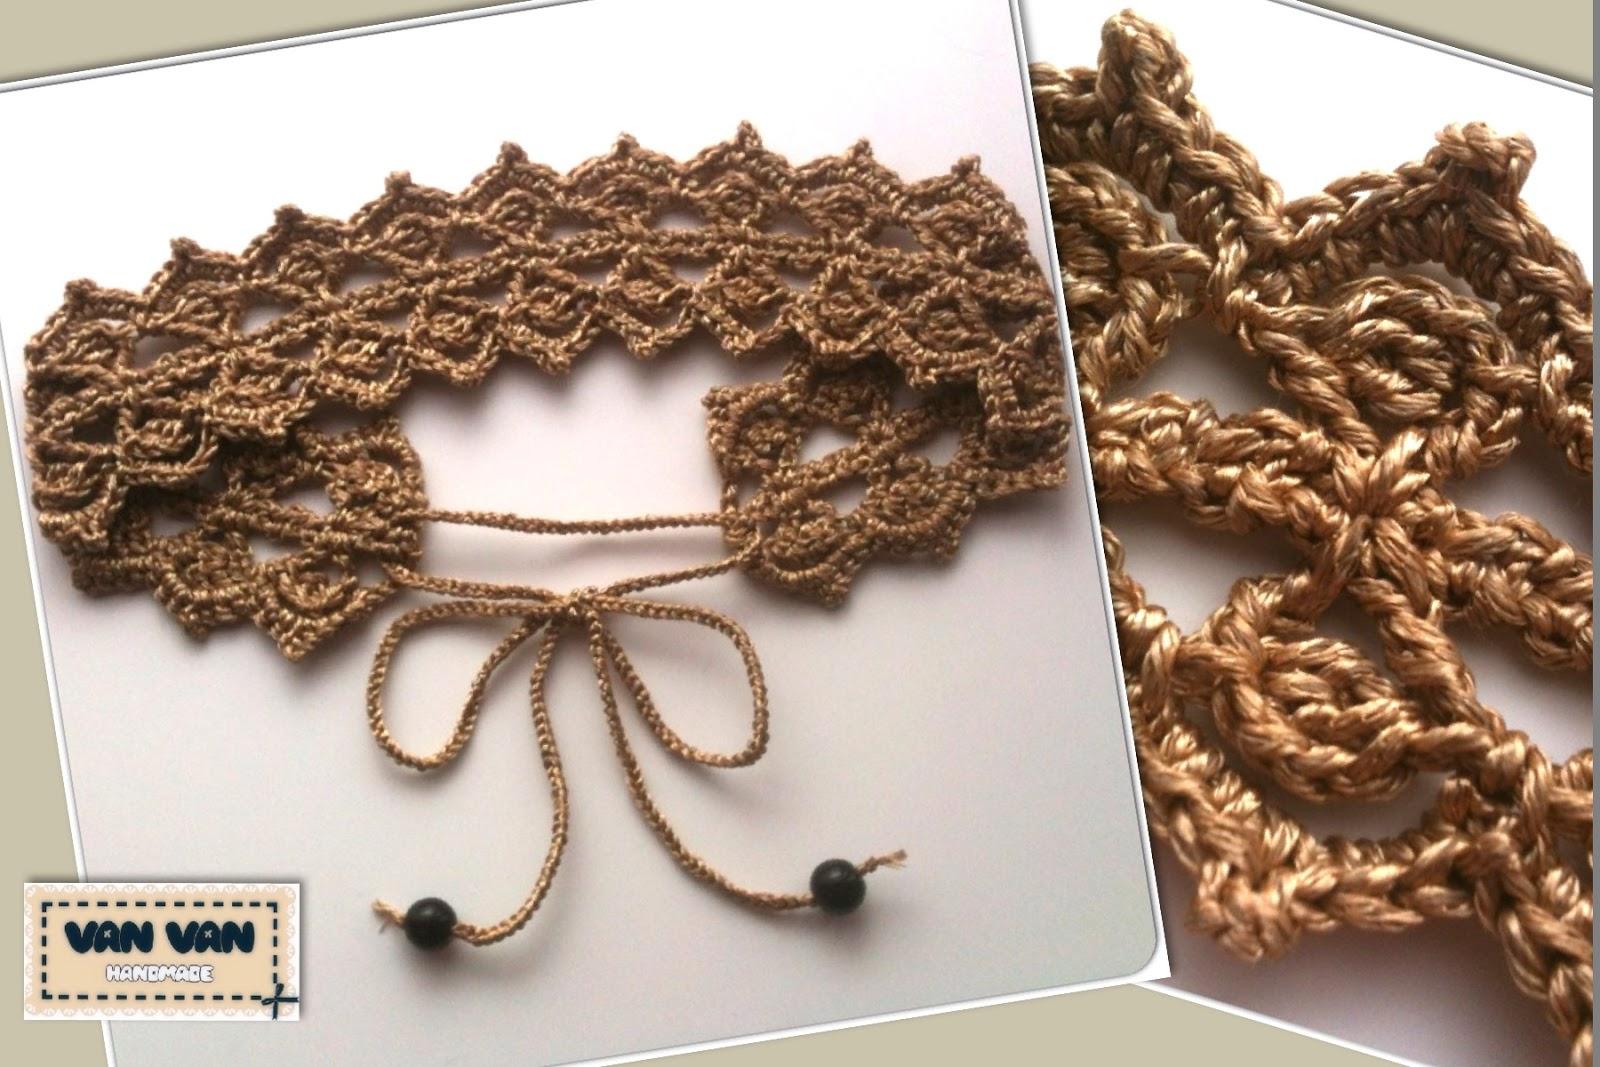 Mostaza Y Media Textil Antes Van Van Handmade Diadema Reinona - Diadema-ganchillo